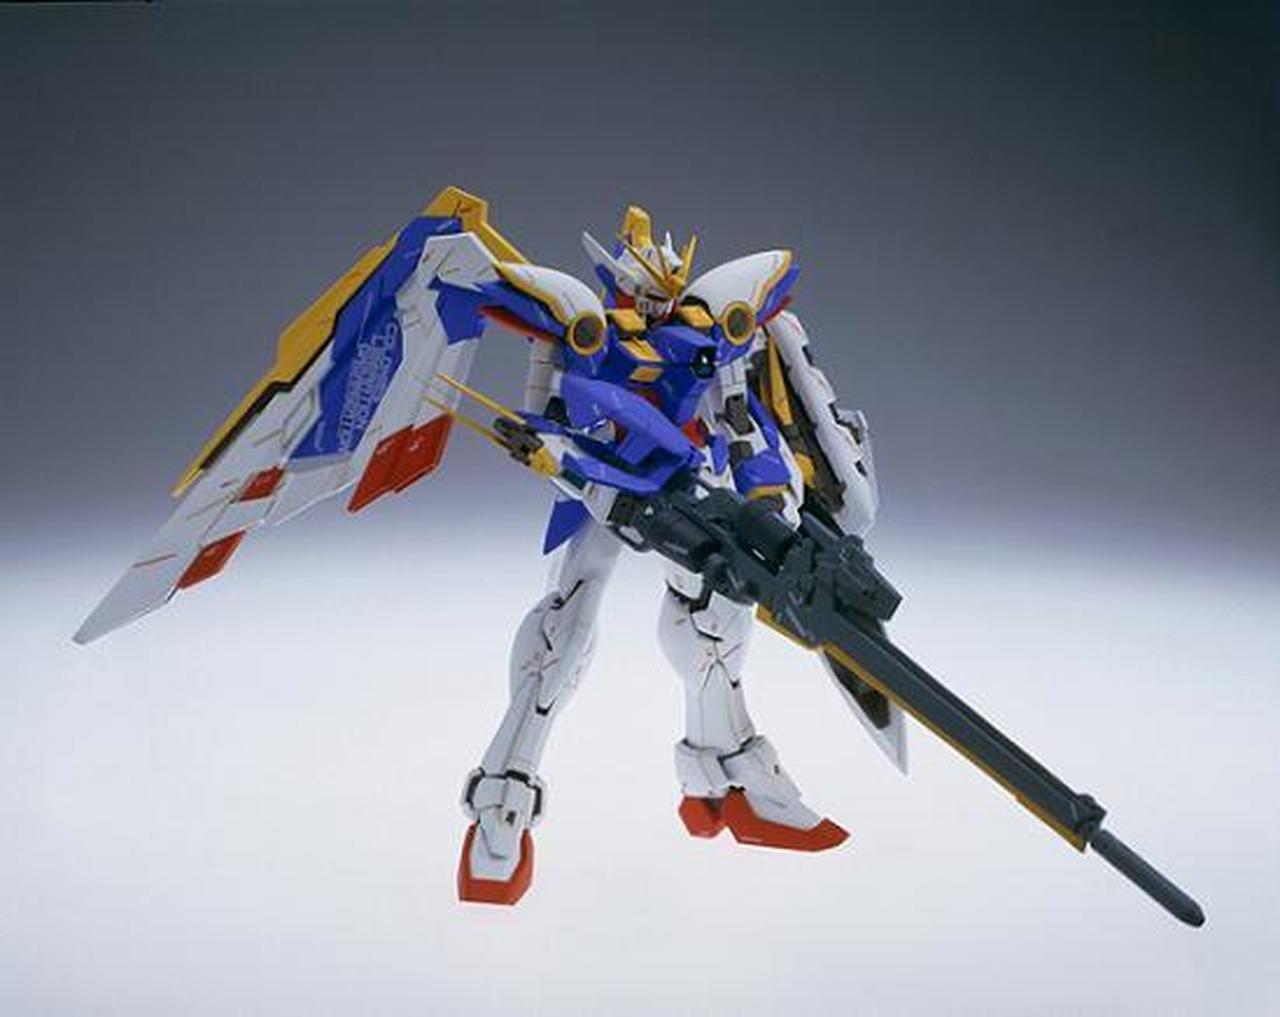 Bandai MG XXXG-01W Wing Gundam Ver. Ka